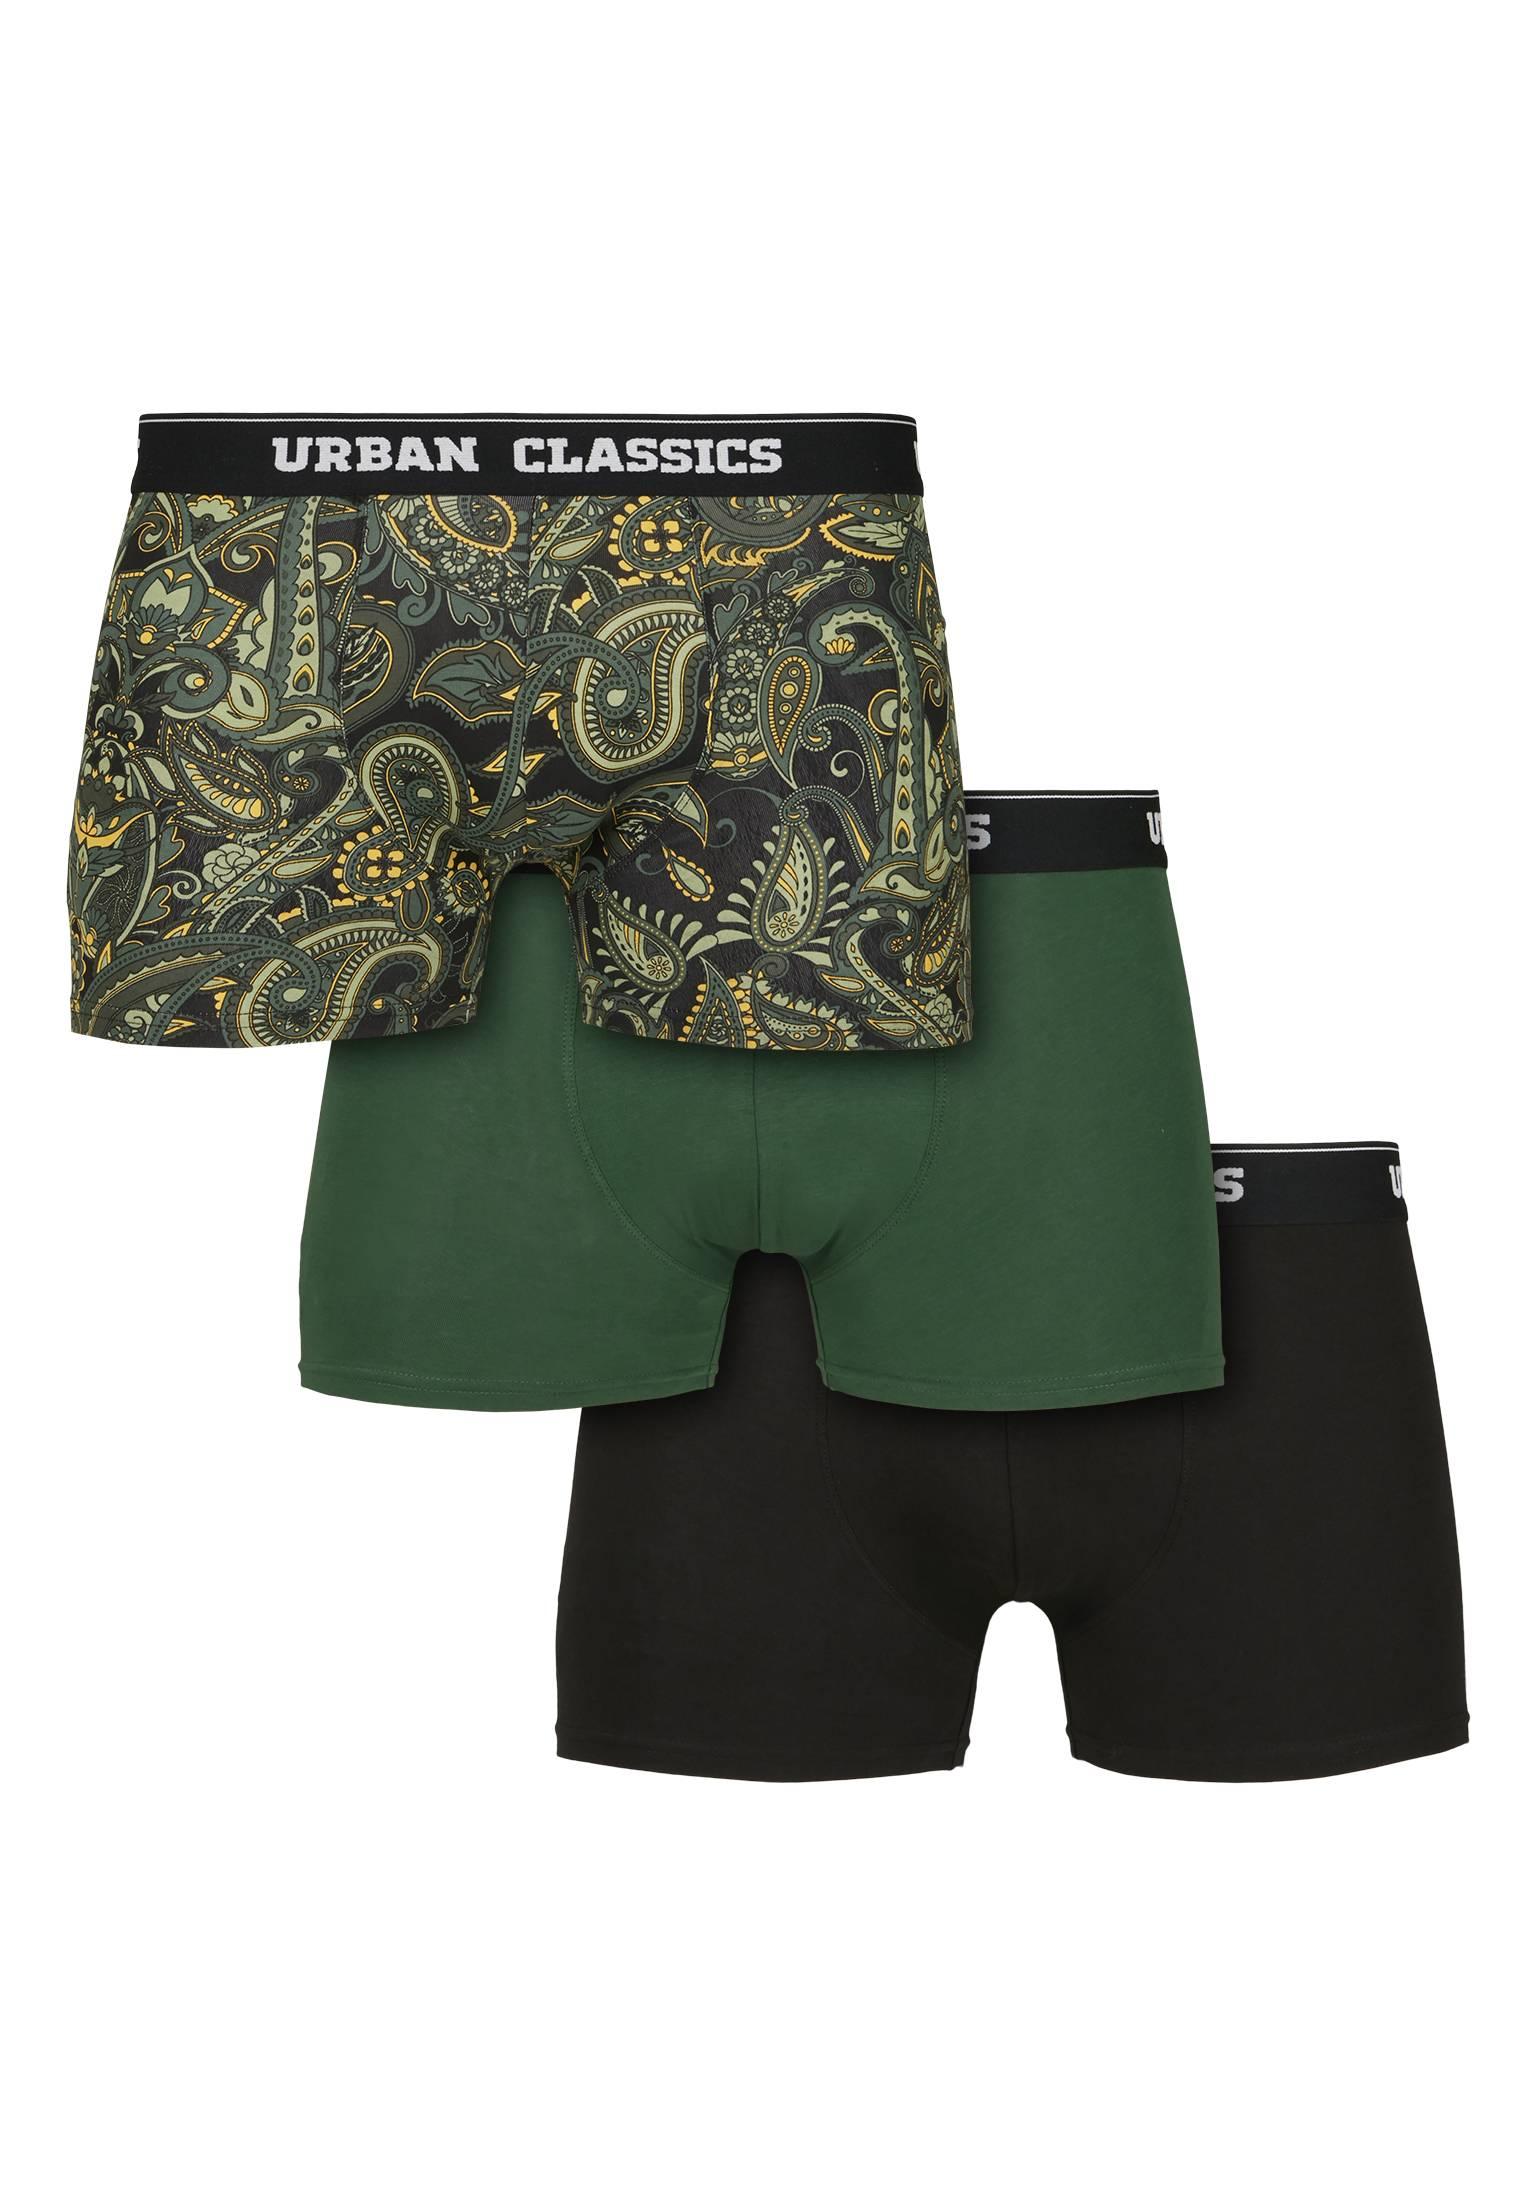 Urban Classics Boxer Shorts 3-Pack darkgreen/paisley/black - L